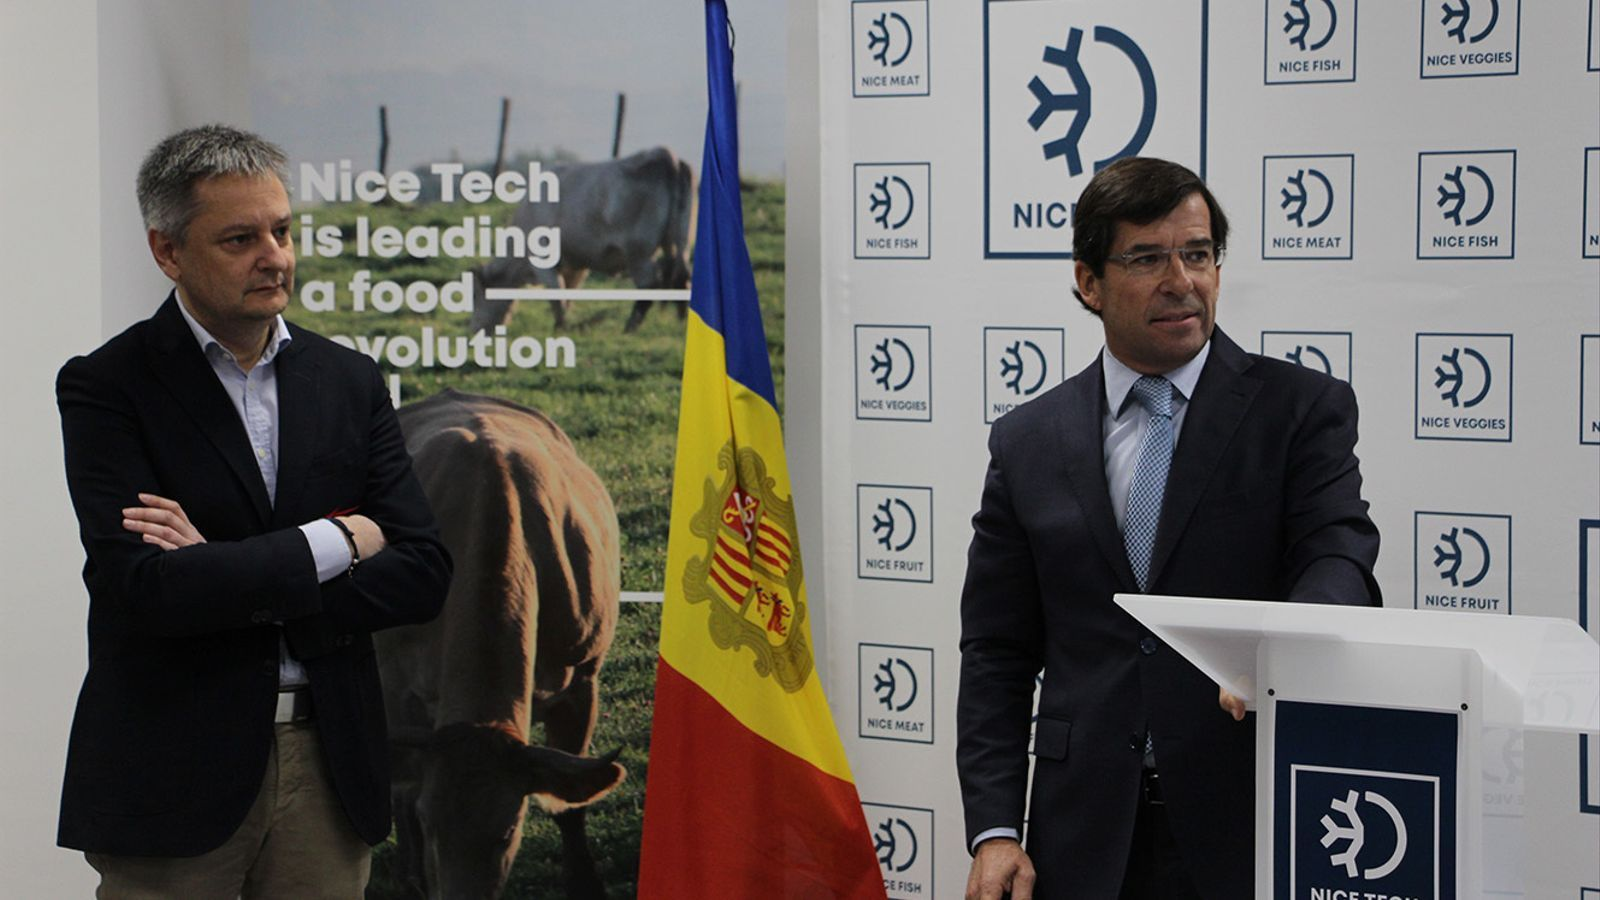 Un moment de la inauguracio del nou centre Nice Tech a Aixovall. / B. N. (ANA)